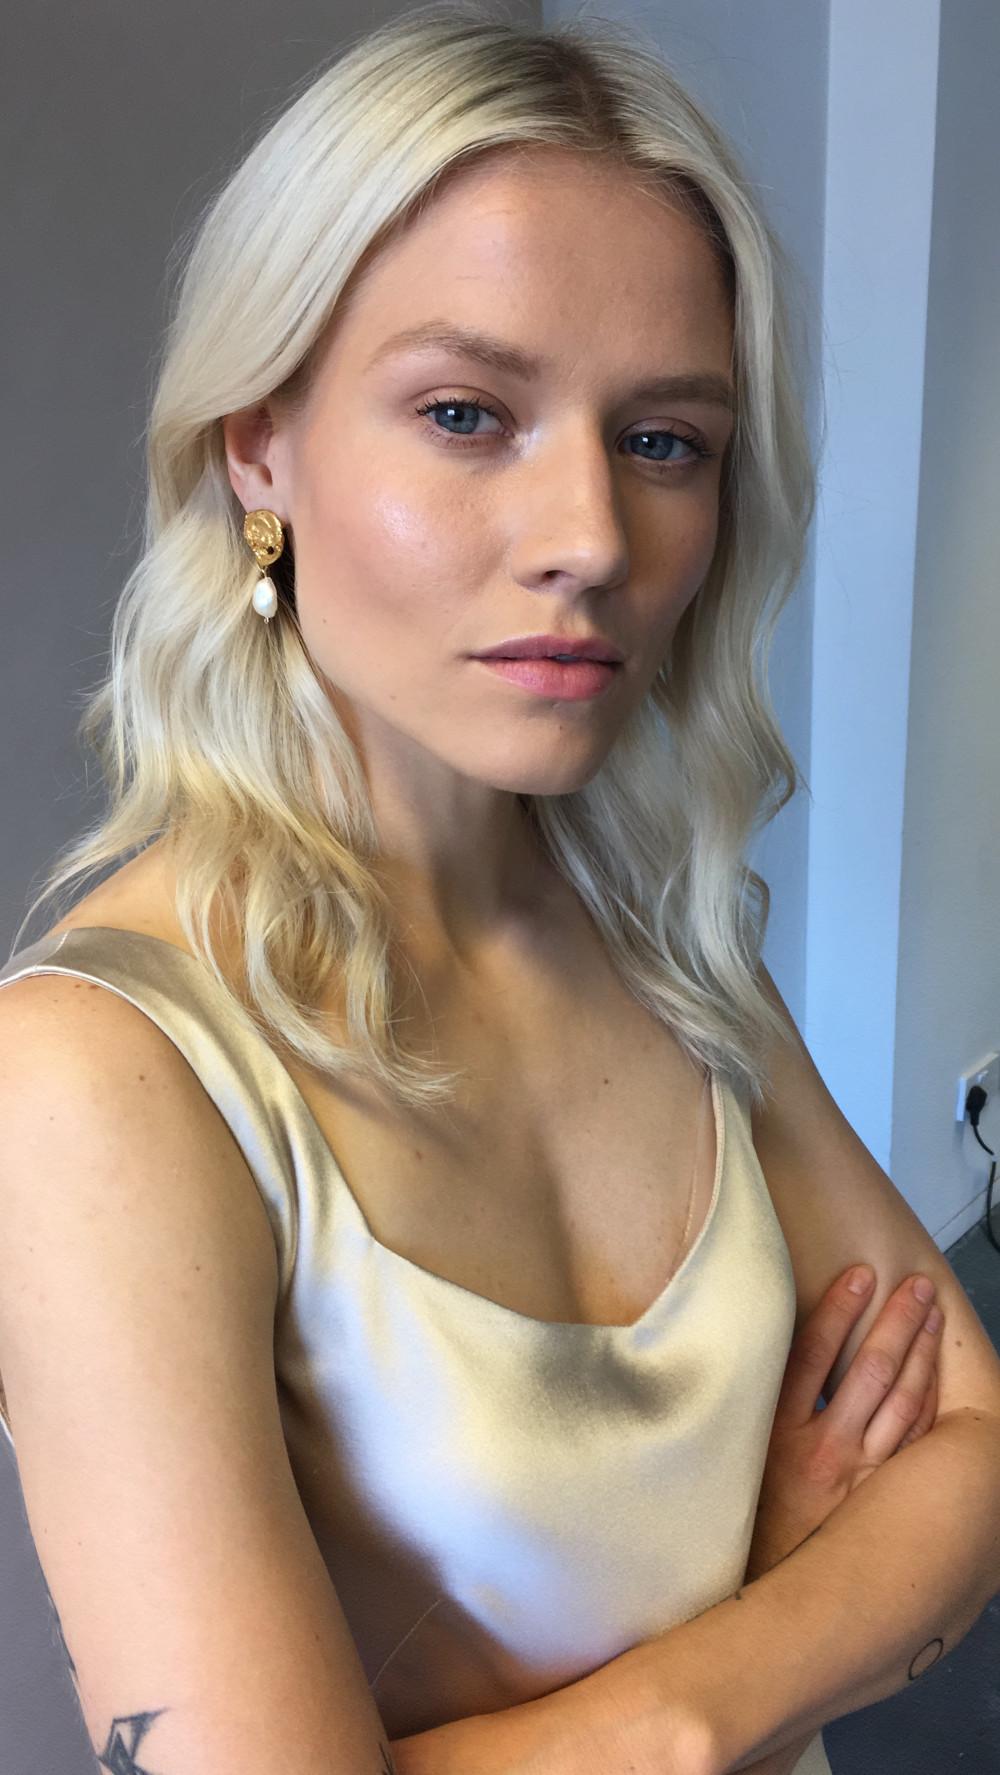 The Own Studios - Makeup + Hair by Quelle Bester - Make Me Bridal Artist: Quelle Bester. Photography by: The Own Studios. #bohemian #classic #naturalmakeup #wavyhair #modern